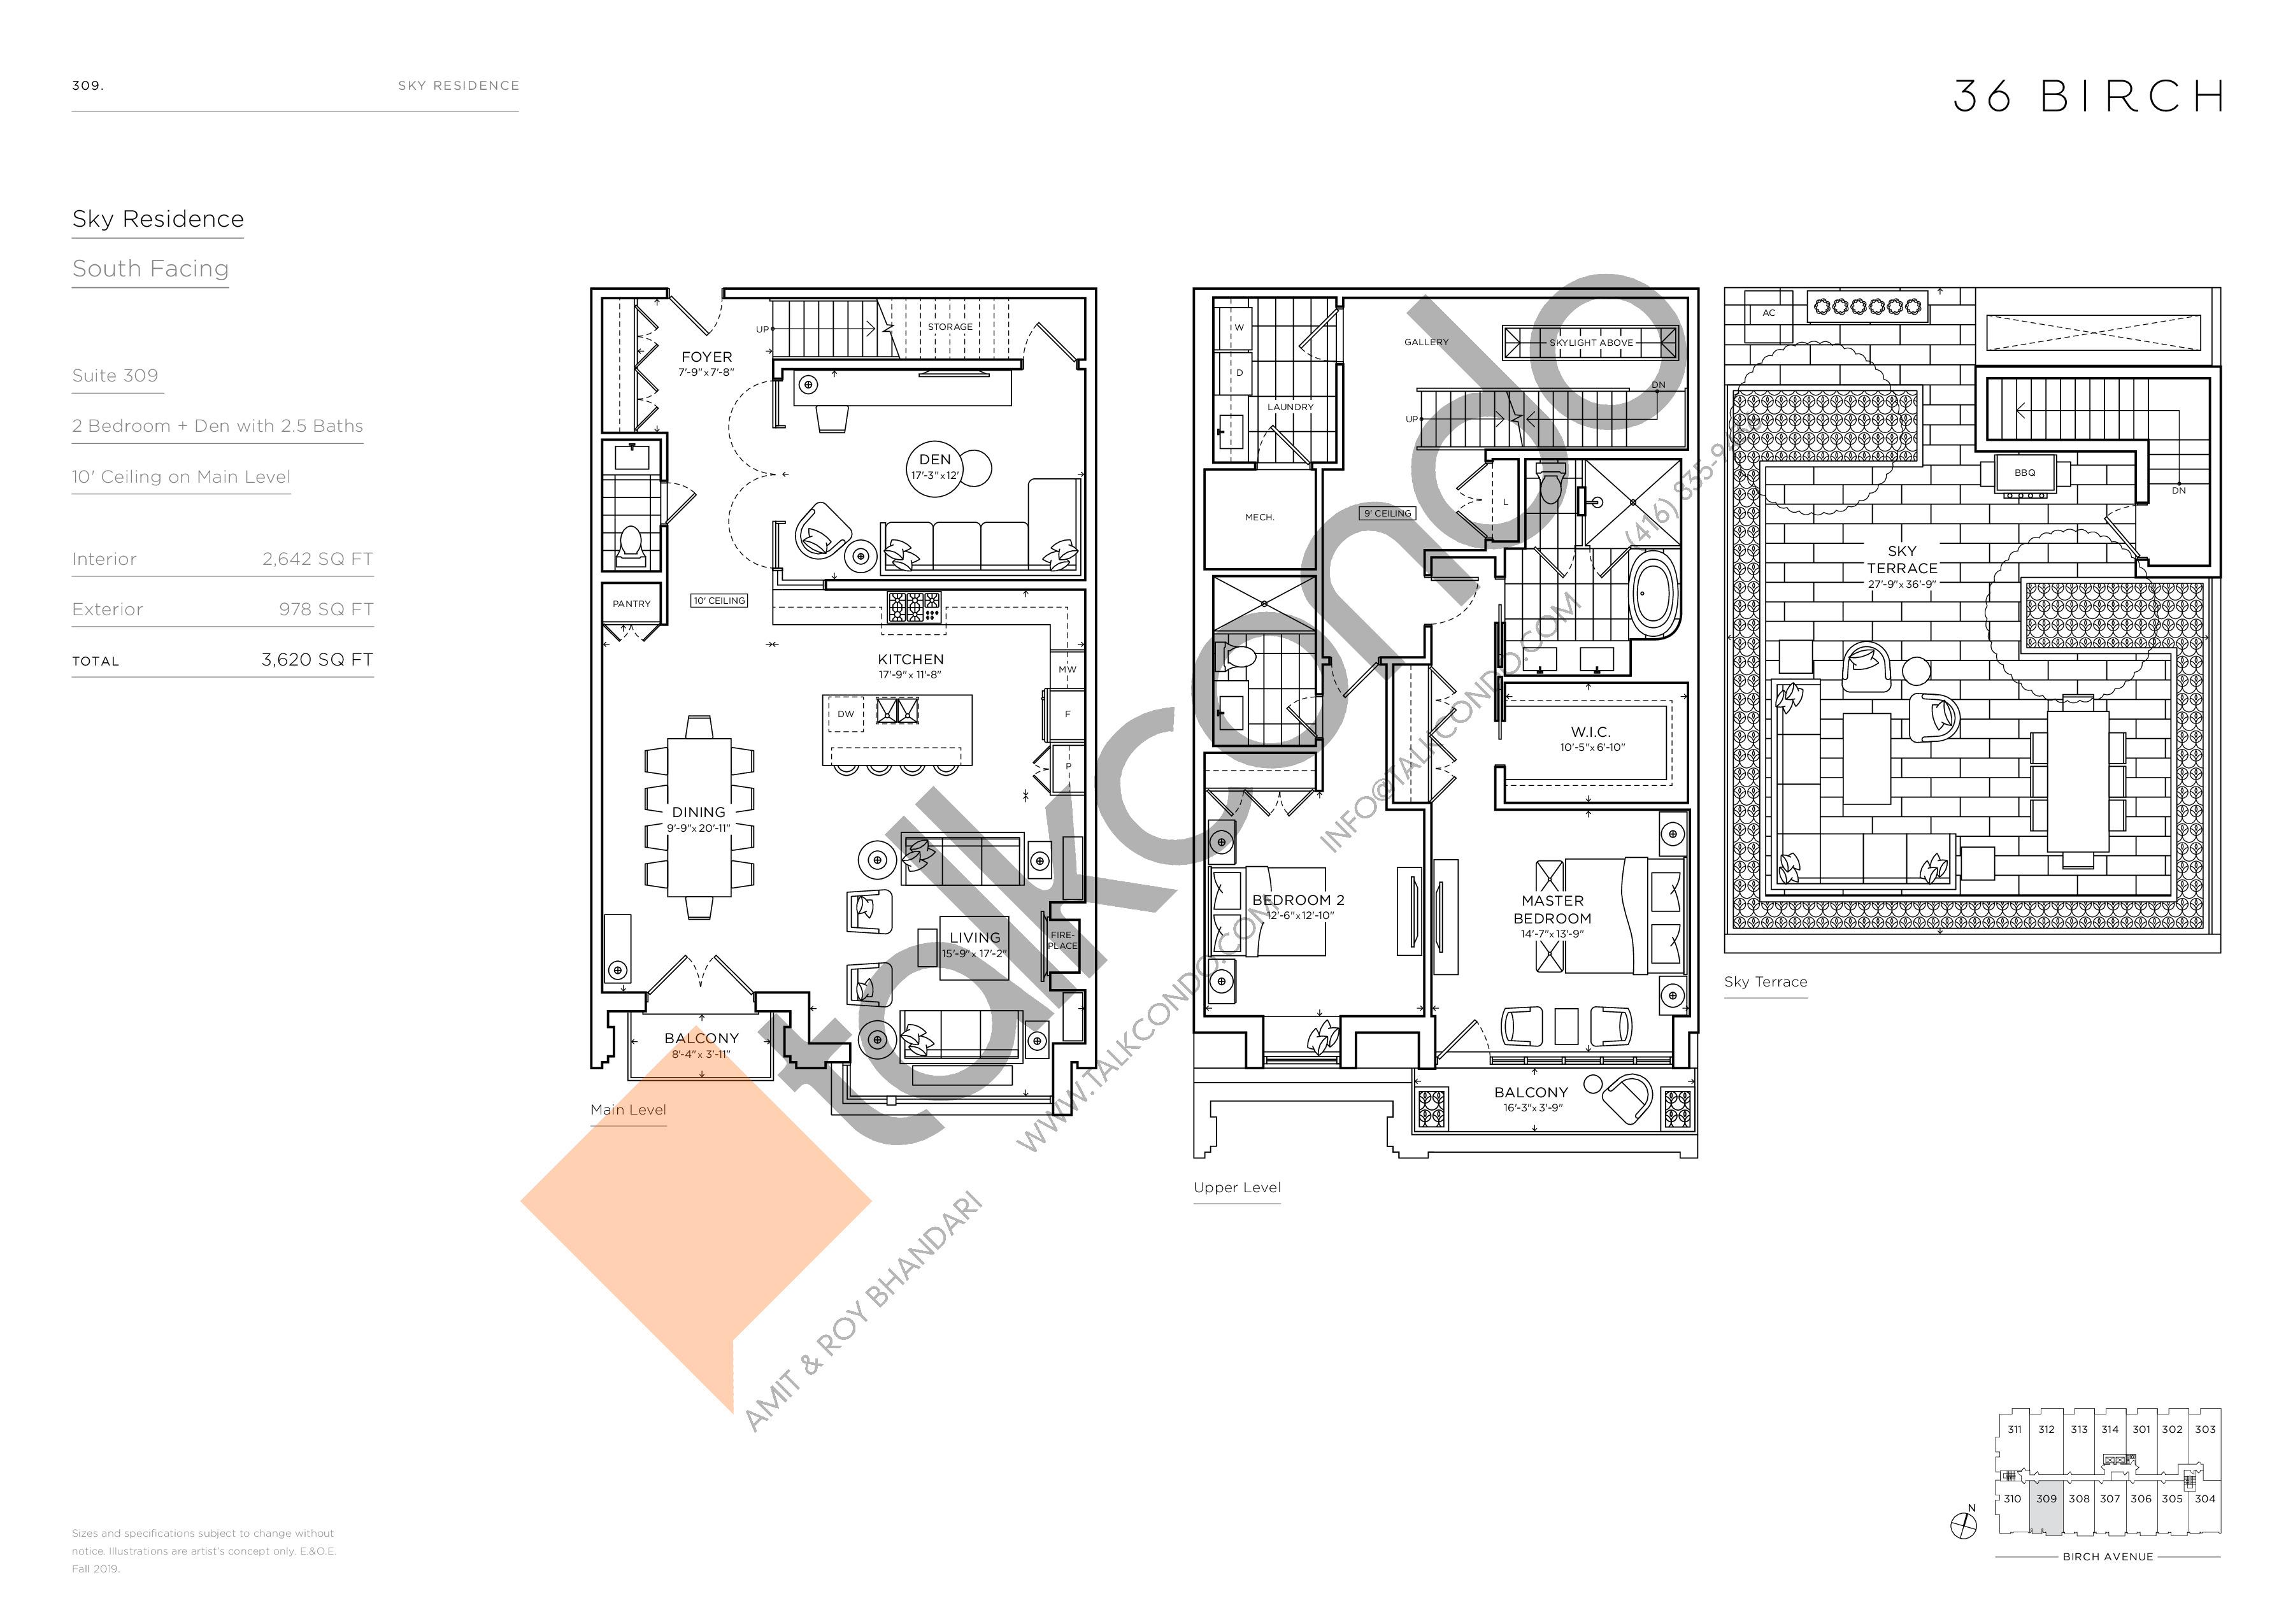 309 - Sky Residence Floor Plan at 36 Birch Condos - 2642 sq.ft